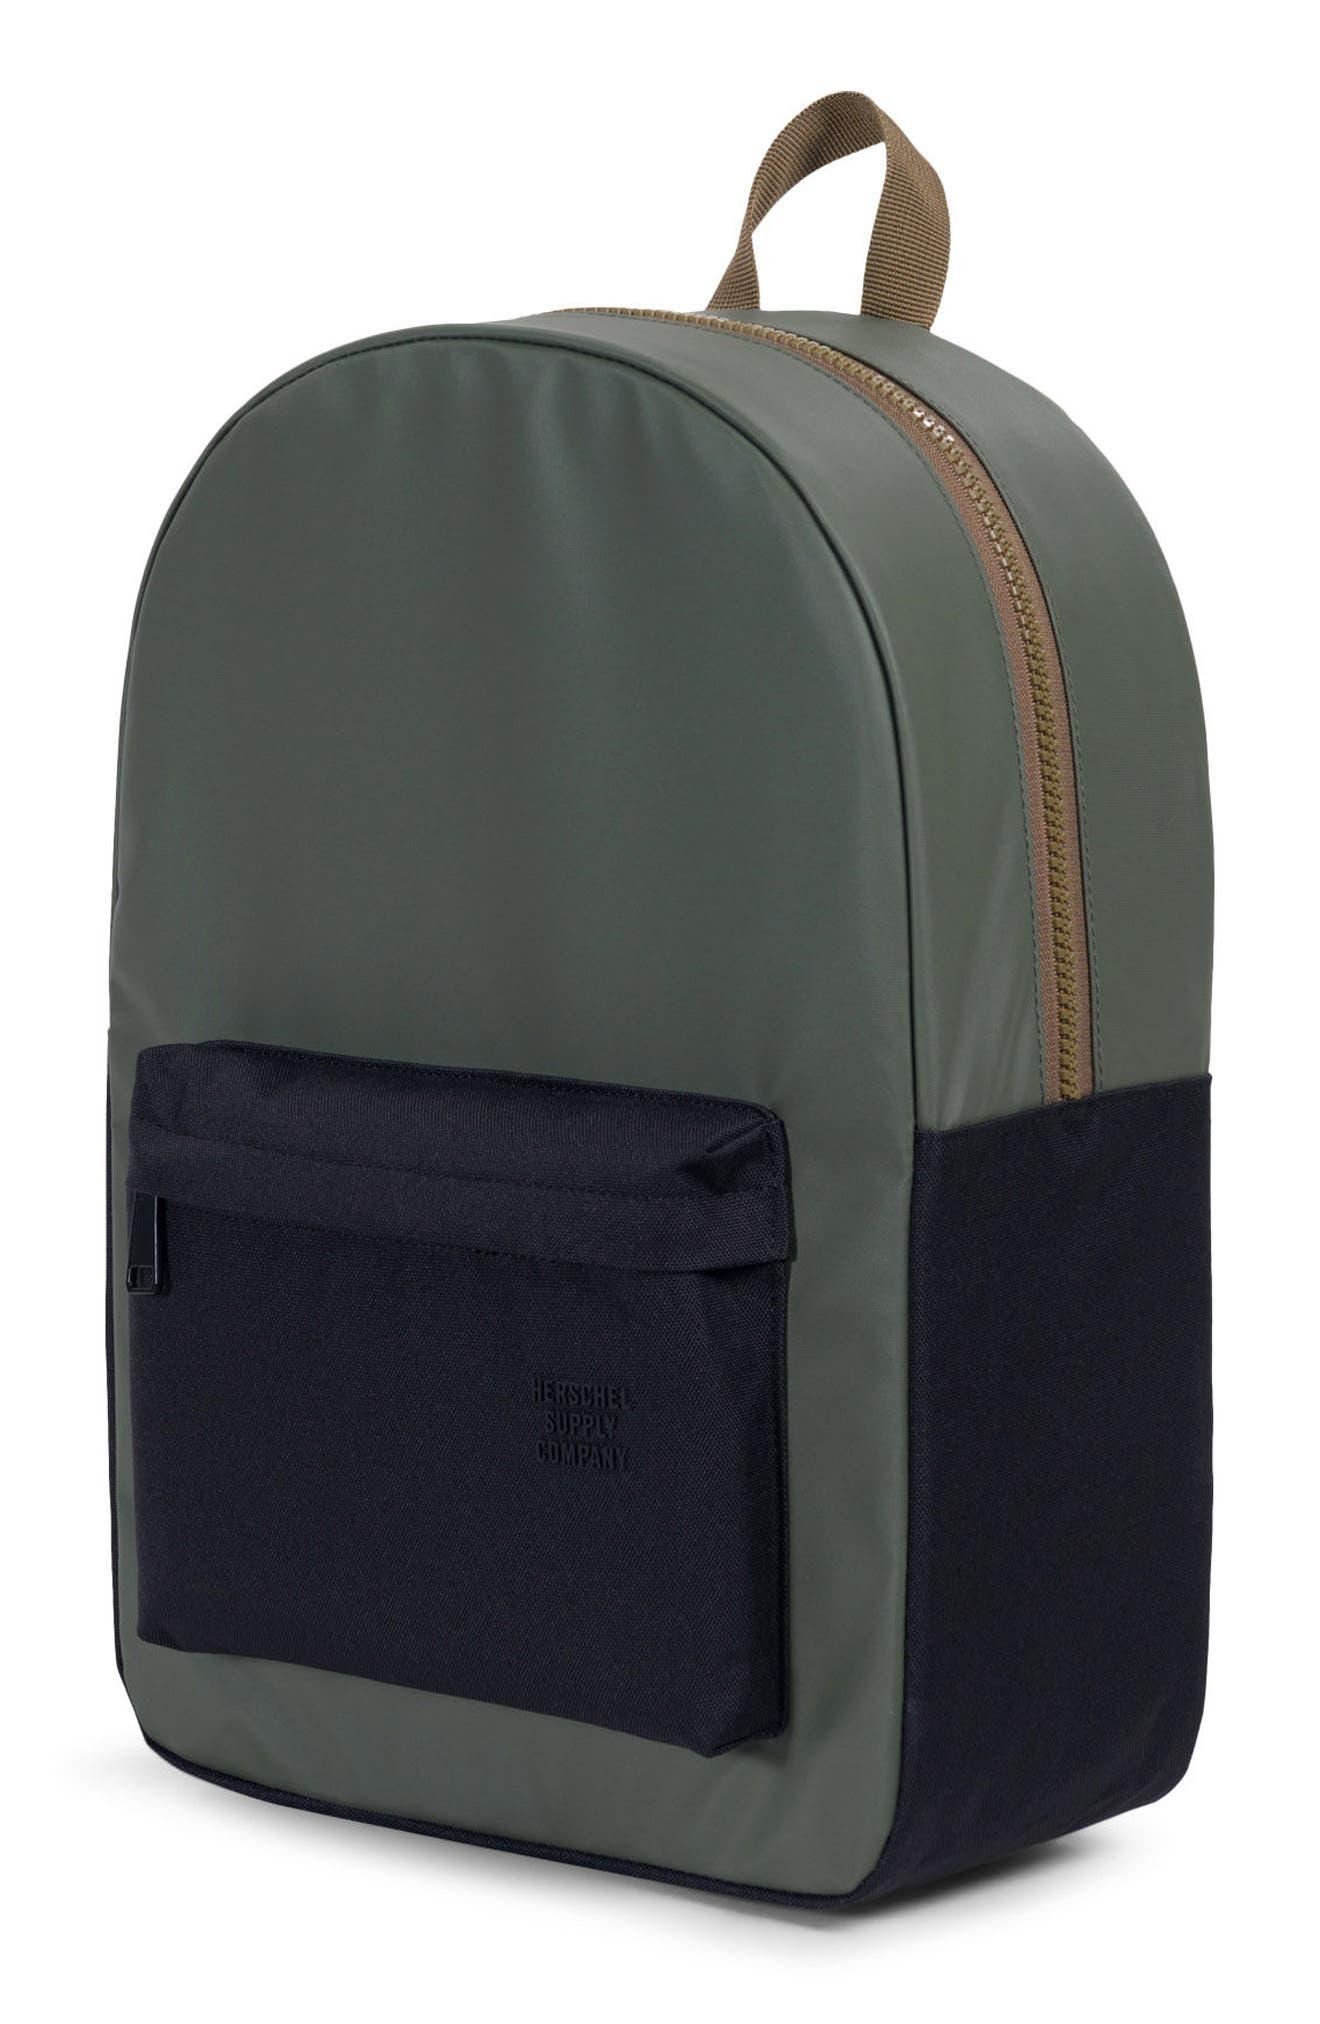 Winlaw Studio Backpack,                             Alternate thumbnail 4, color,                             Beetle Black/ Goth Olive